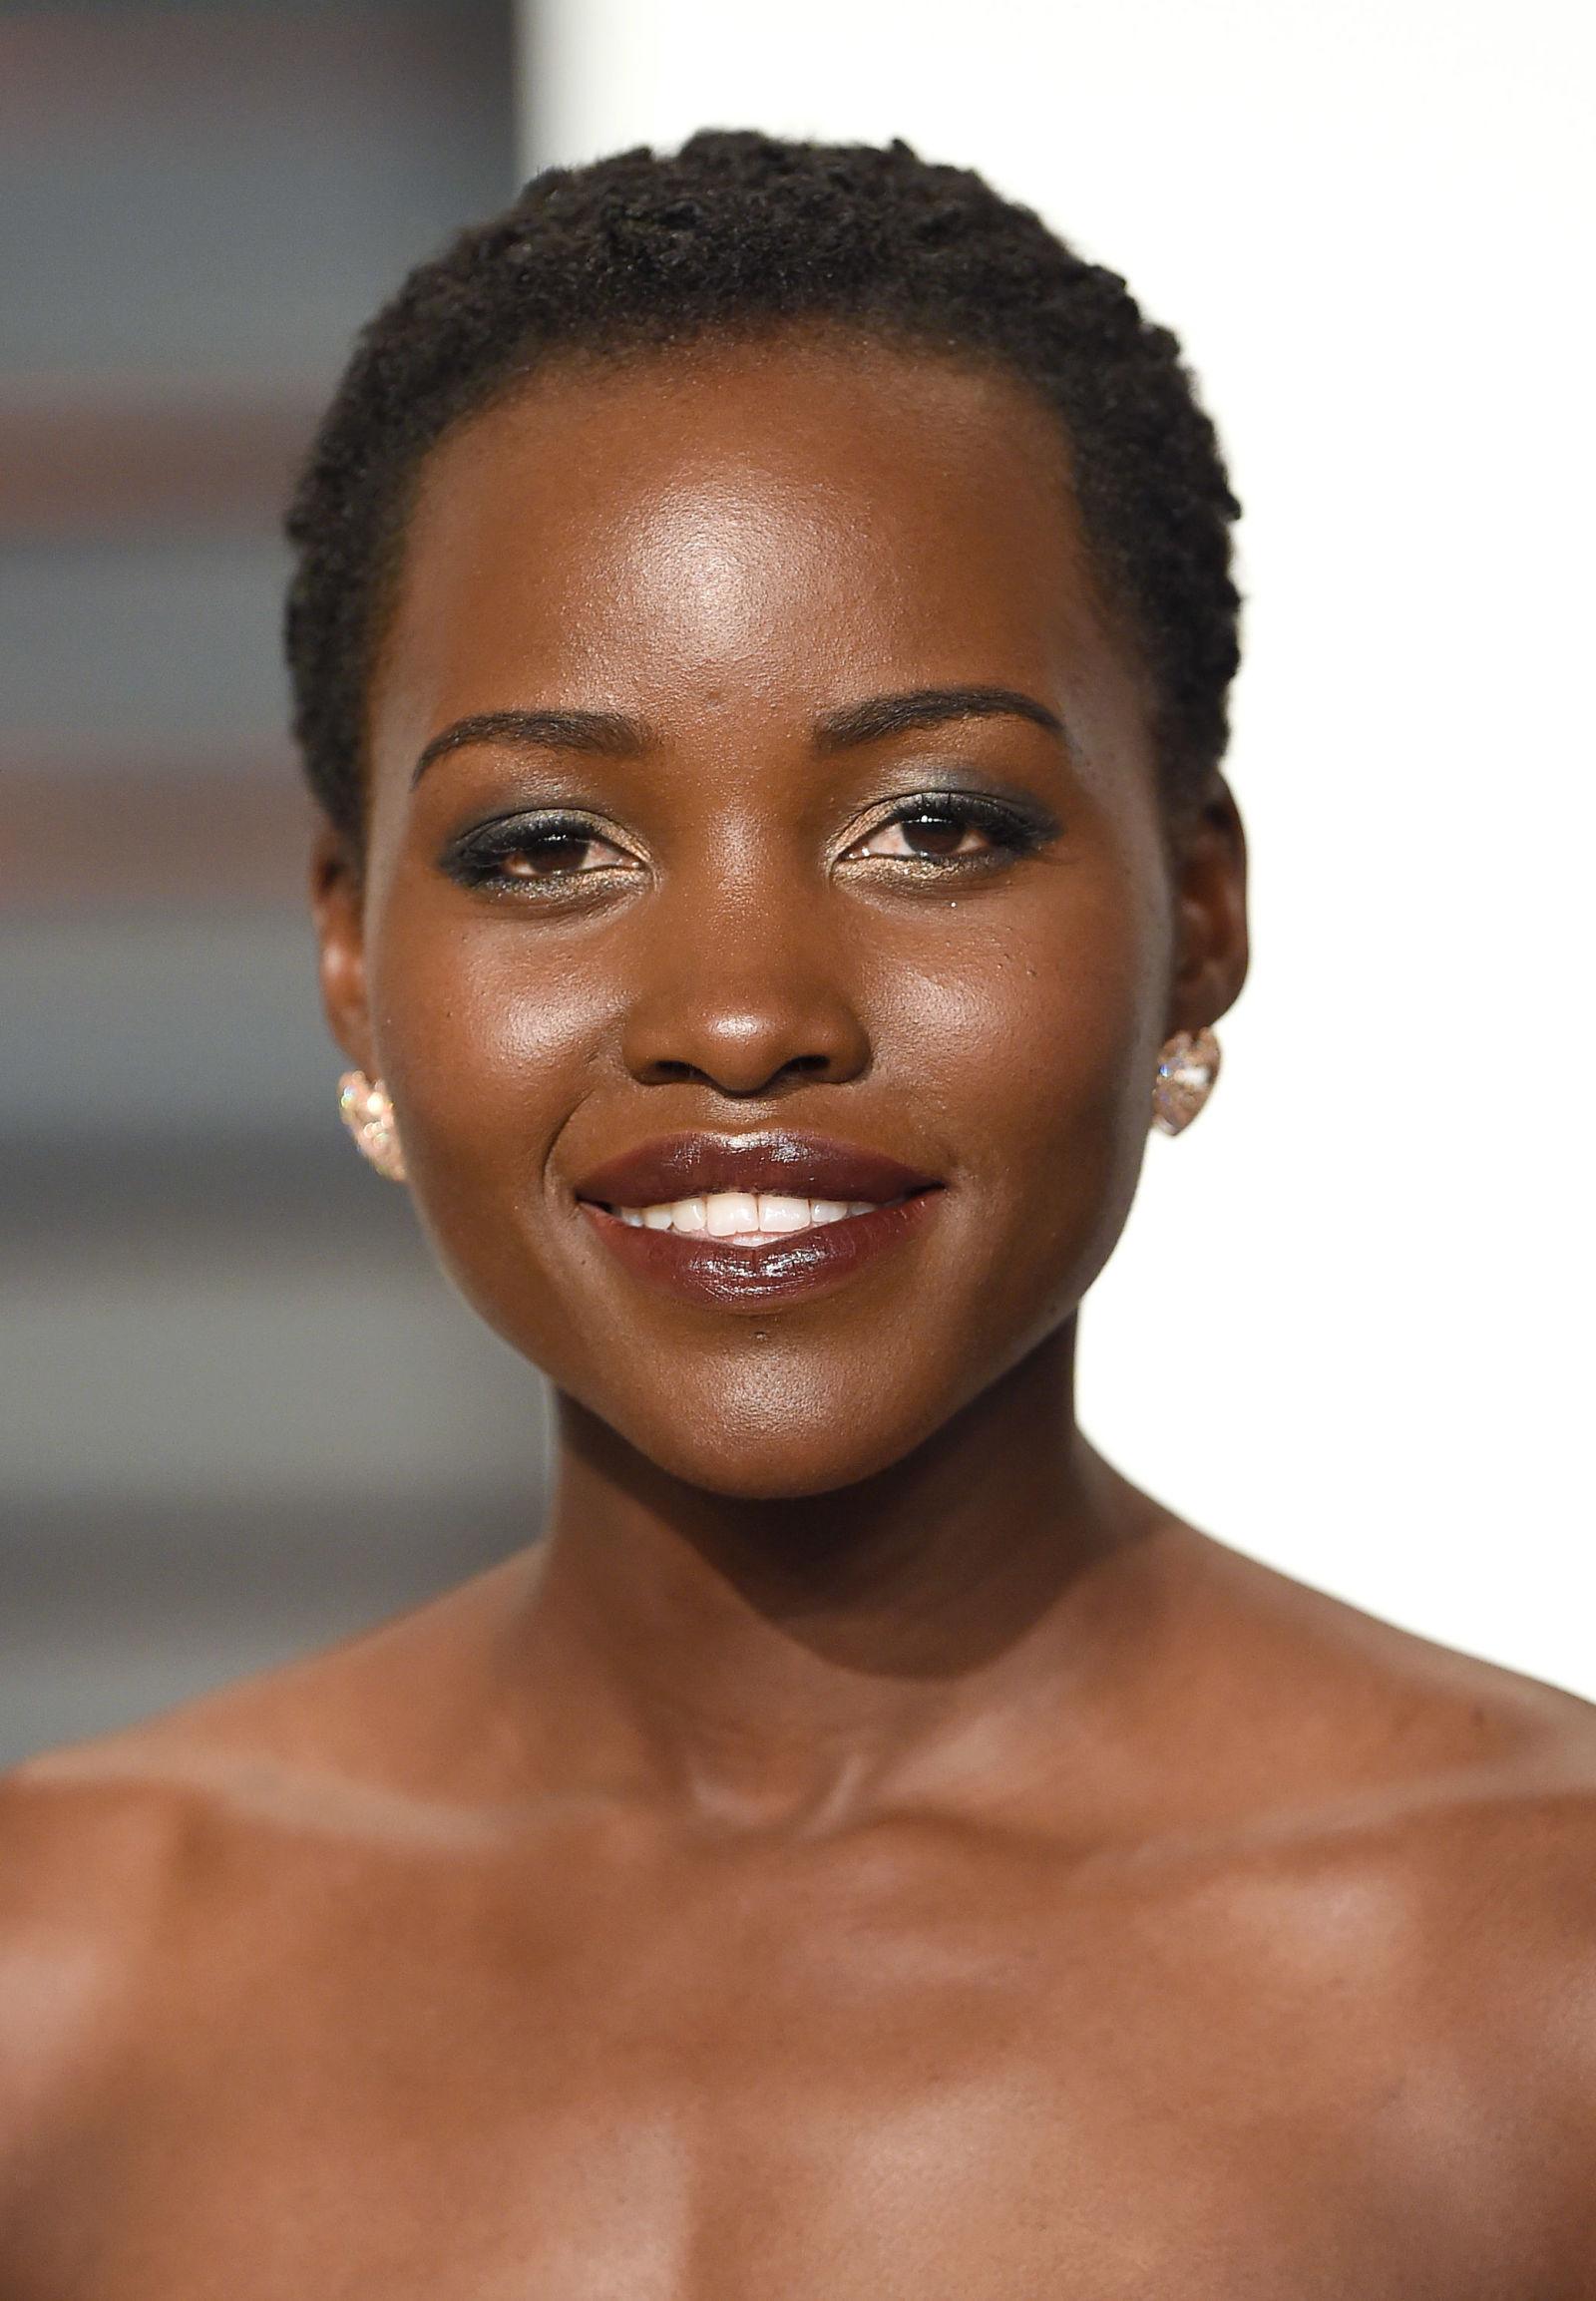 Jazzy Black Women Short Hairstyles 2016 | Hairstyles 2017, Hair Inside Black Women Short Haircuts (View 4 of 25)